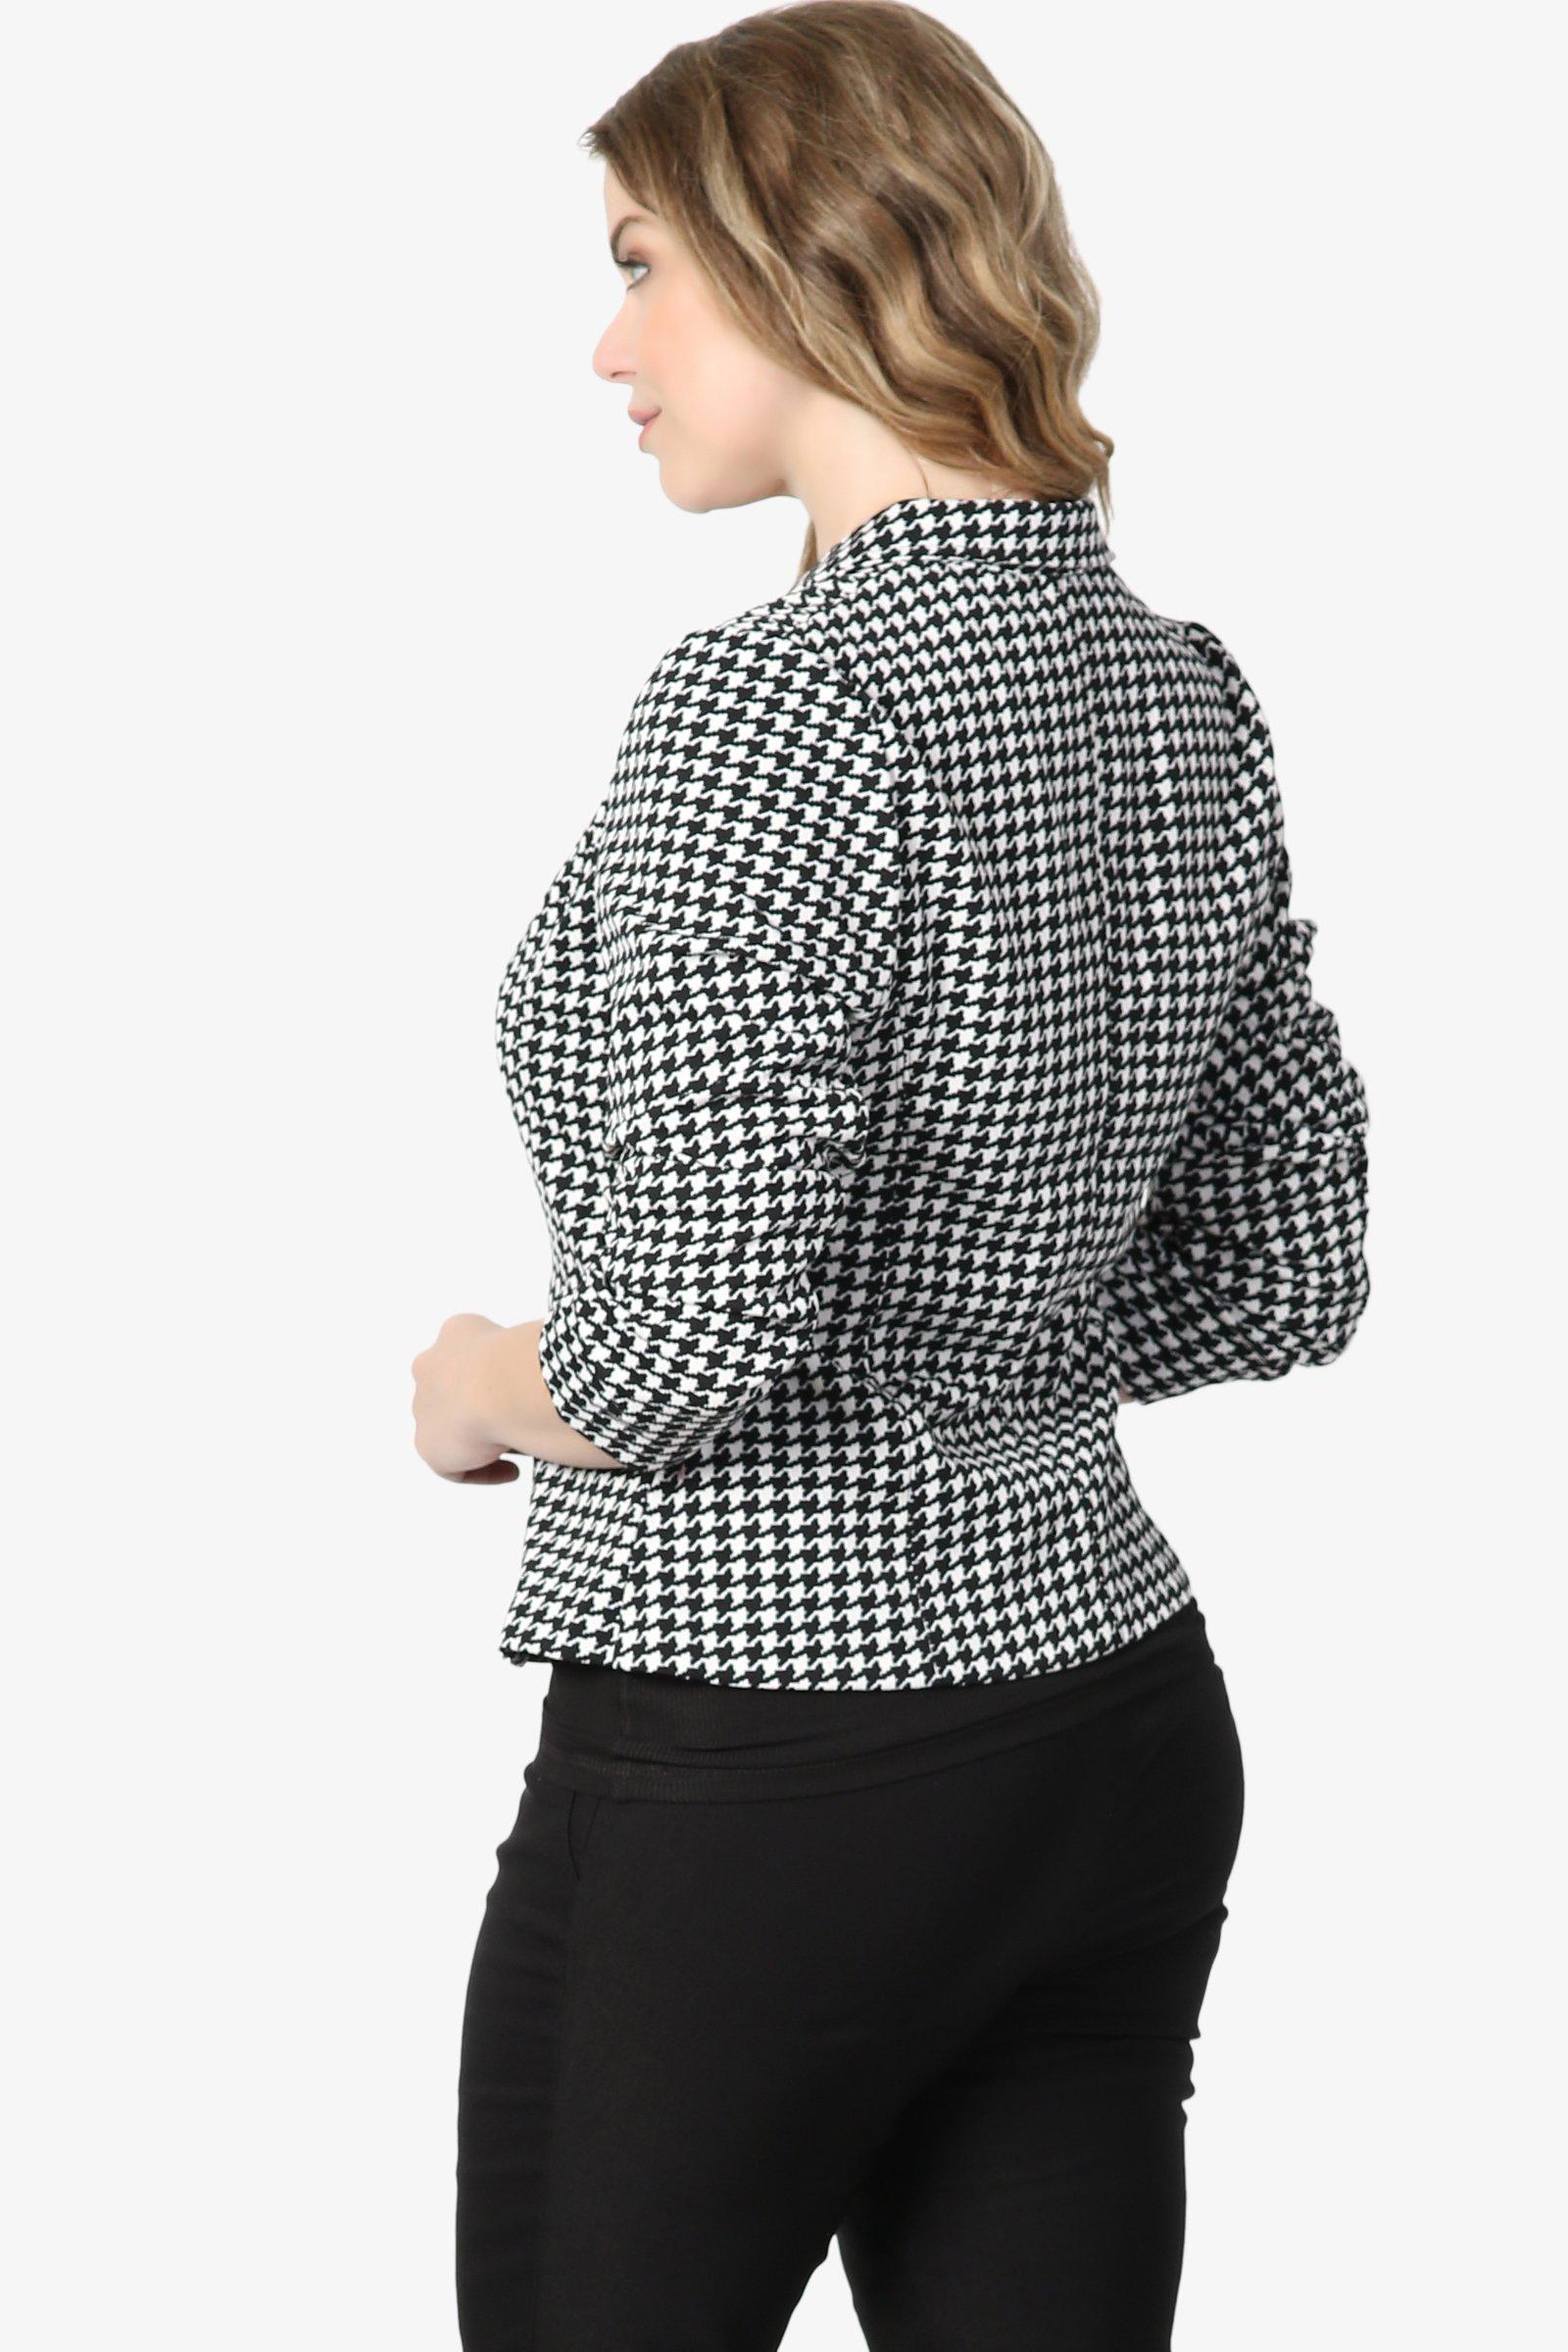 TheMogan Junior's Checker Faux Leather Pocket Slim Fit Blazer Jacket Black 1XL by TheMogan (Image #4)